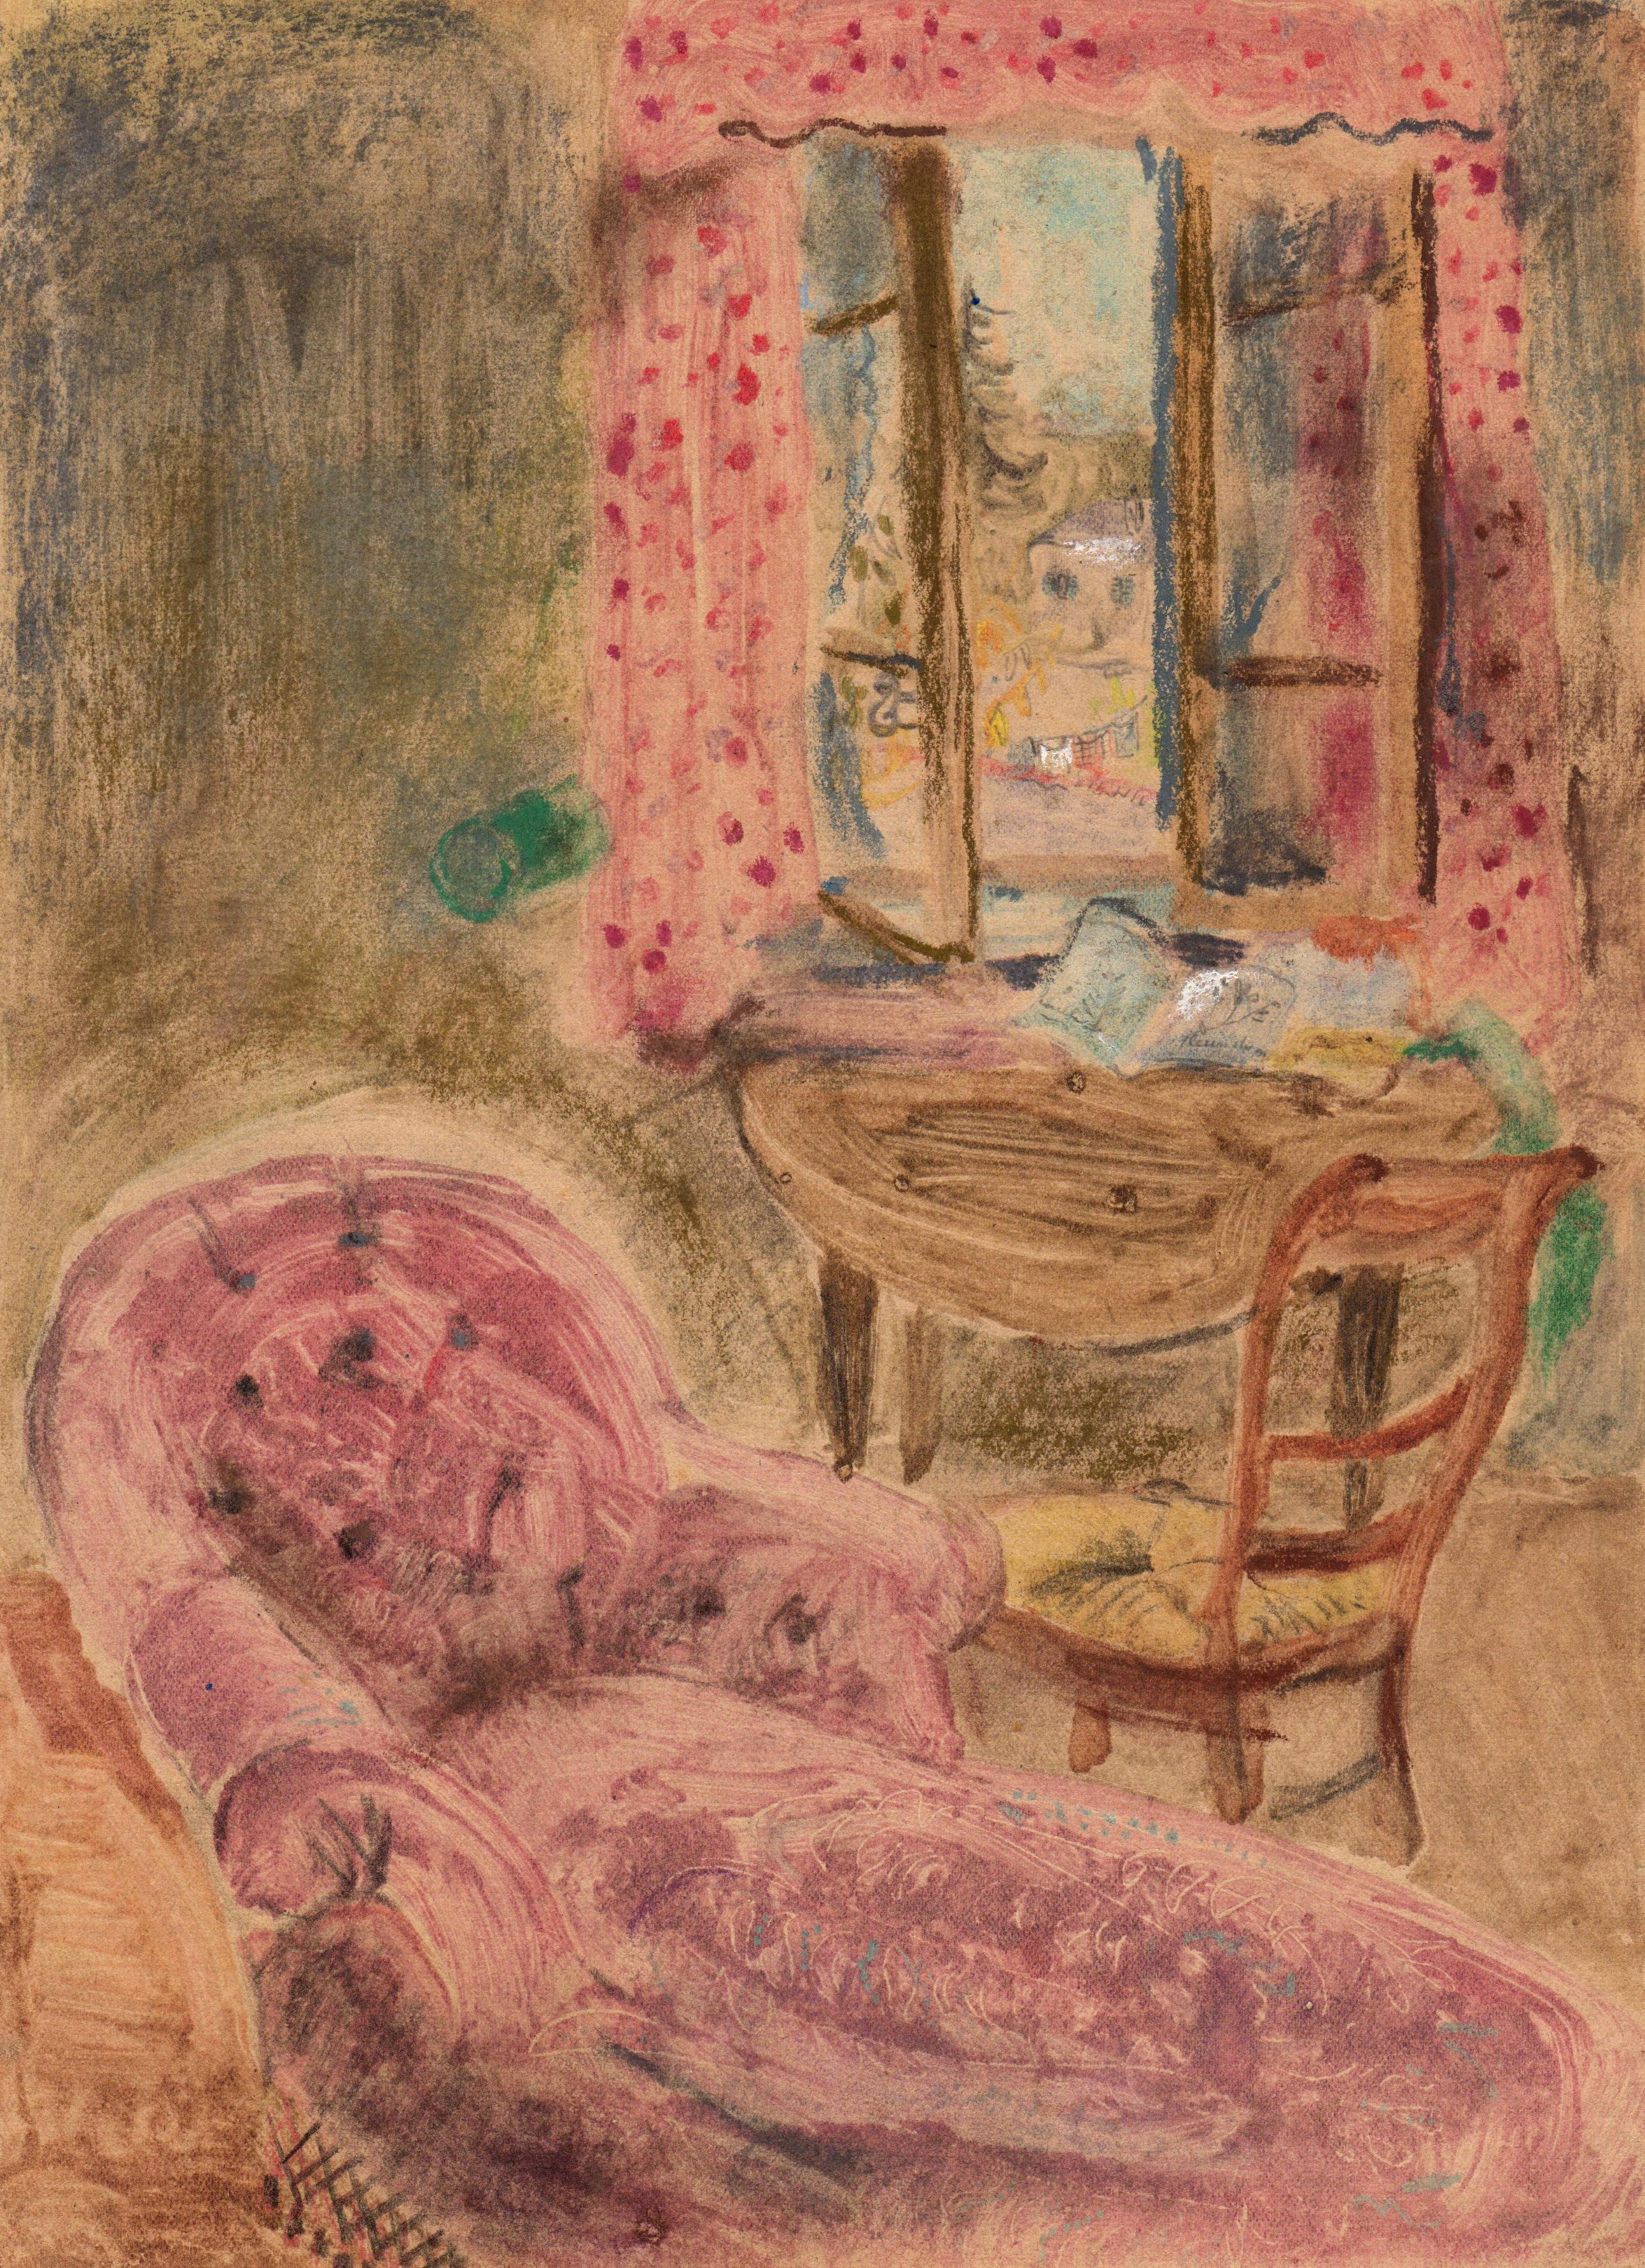 Suzanne Humbert | La méridienne | Suzanne Humbert